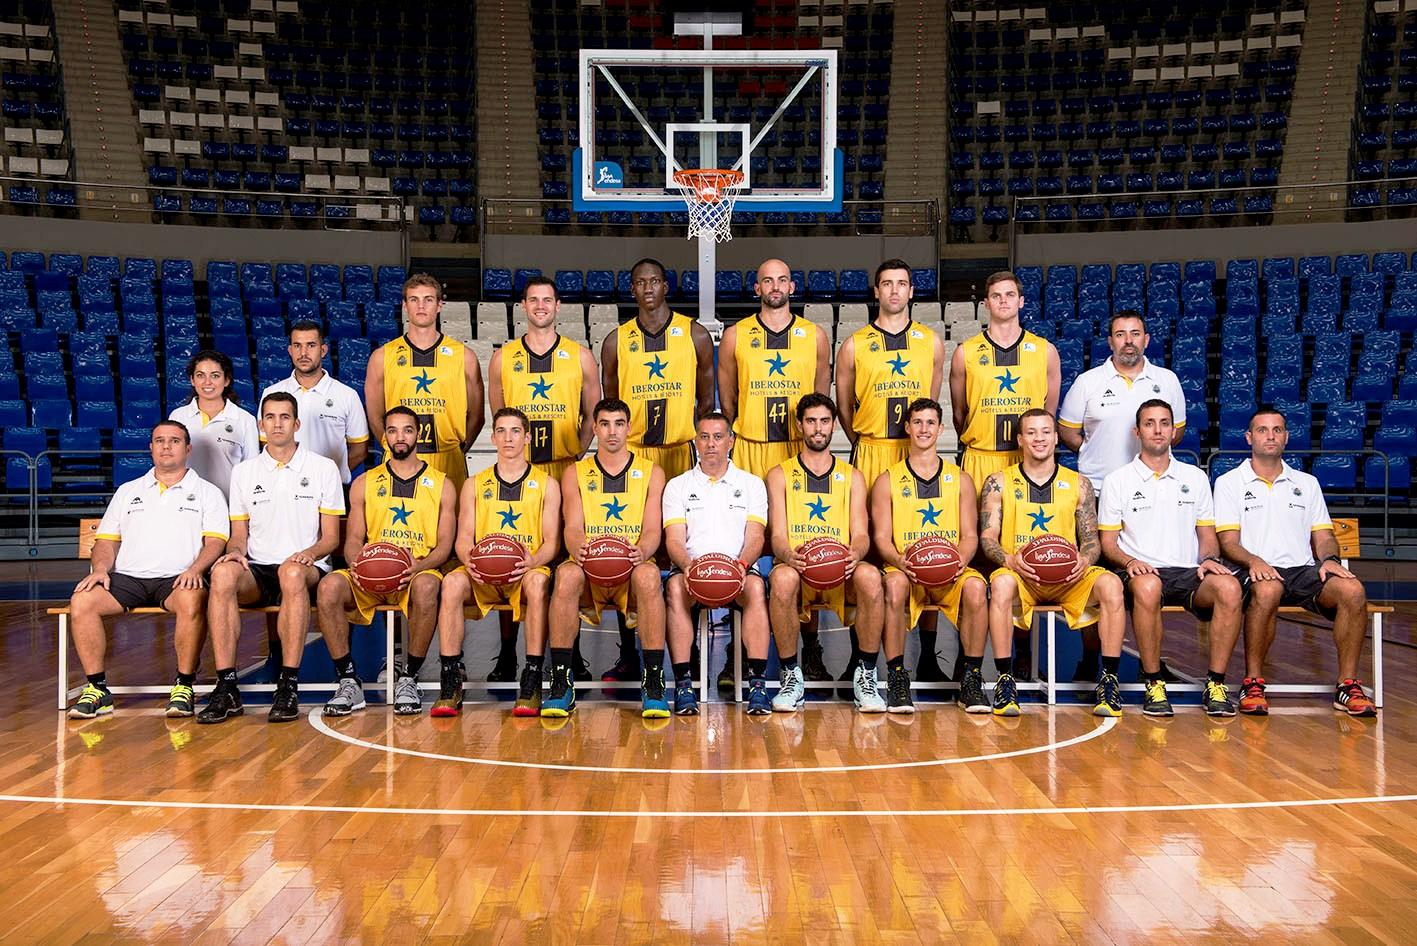 Club Baloncesto Canarias 2015-16